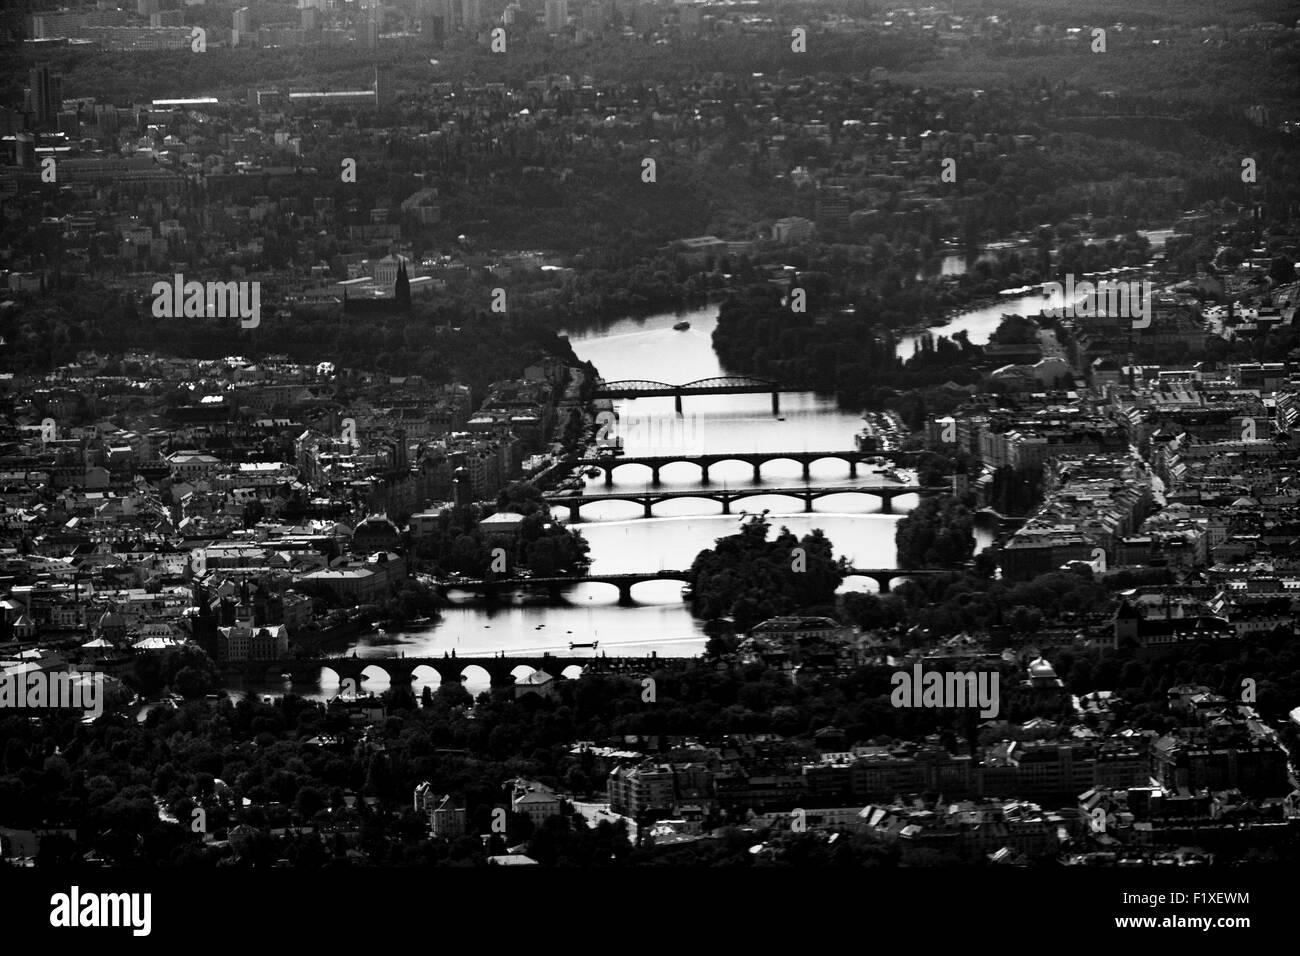 Black and white photo of the bridges over the Vltava river in Prague, Czech Republic, Europe - Stock Image